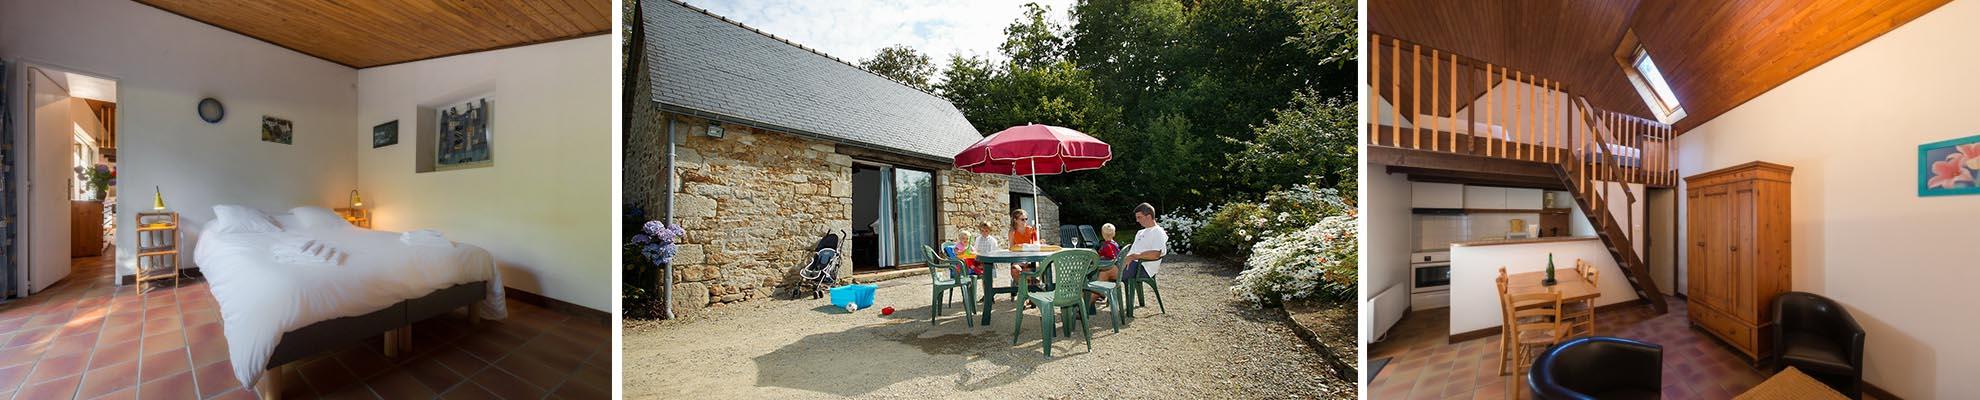 camping-lanniron-maison-champ